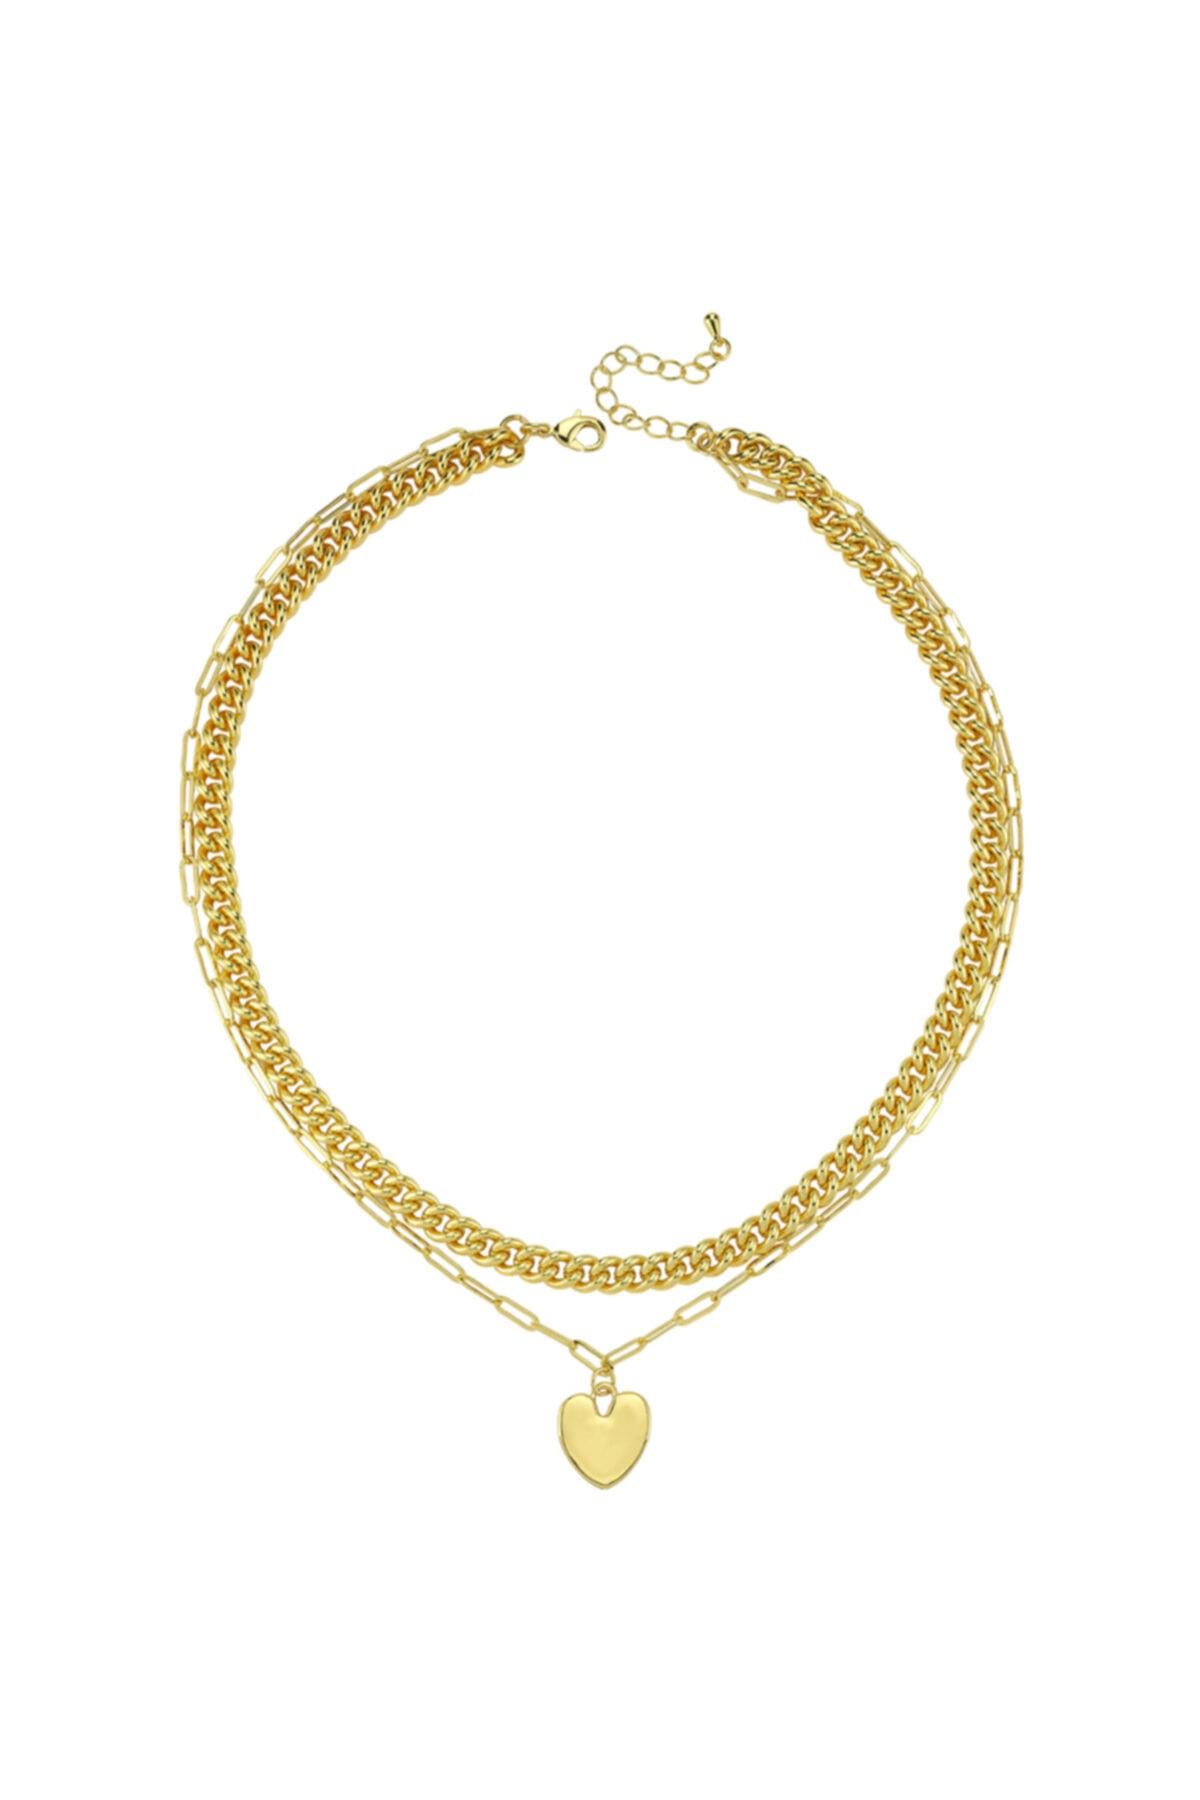 Luzdemia Rebellious Love Necklace 1